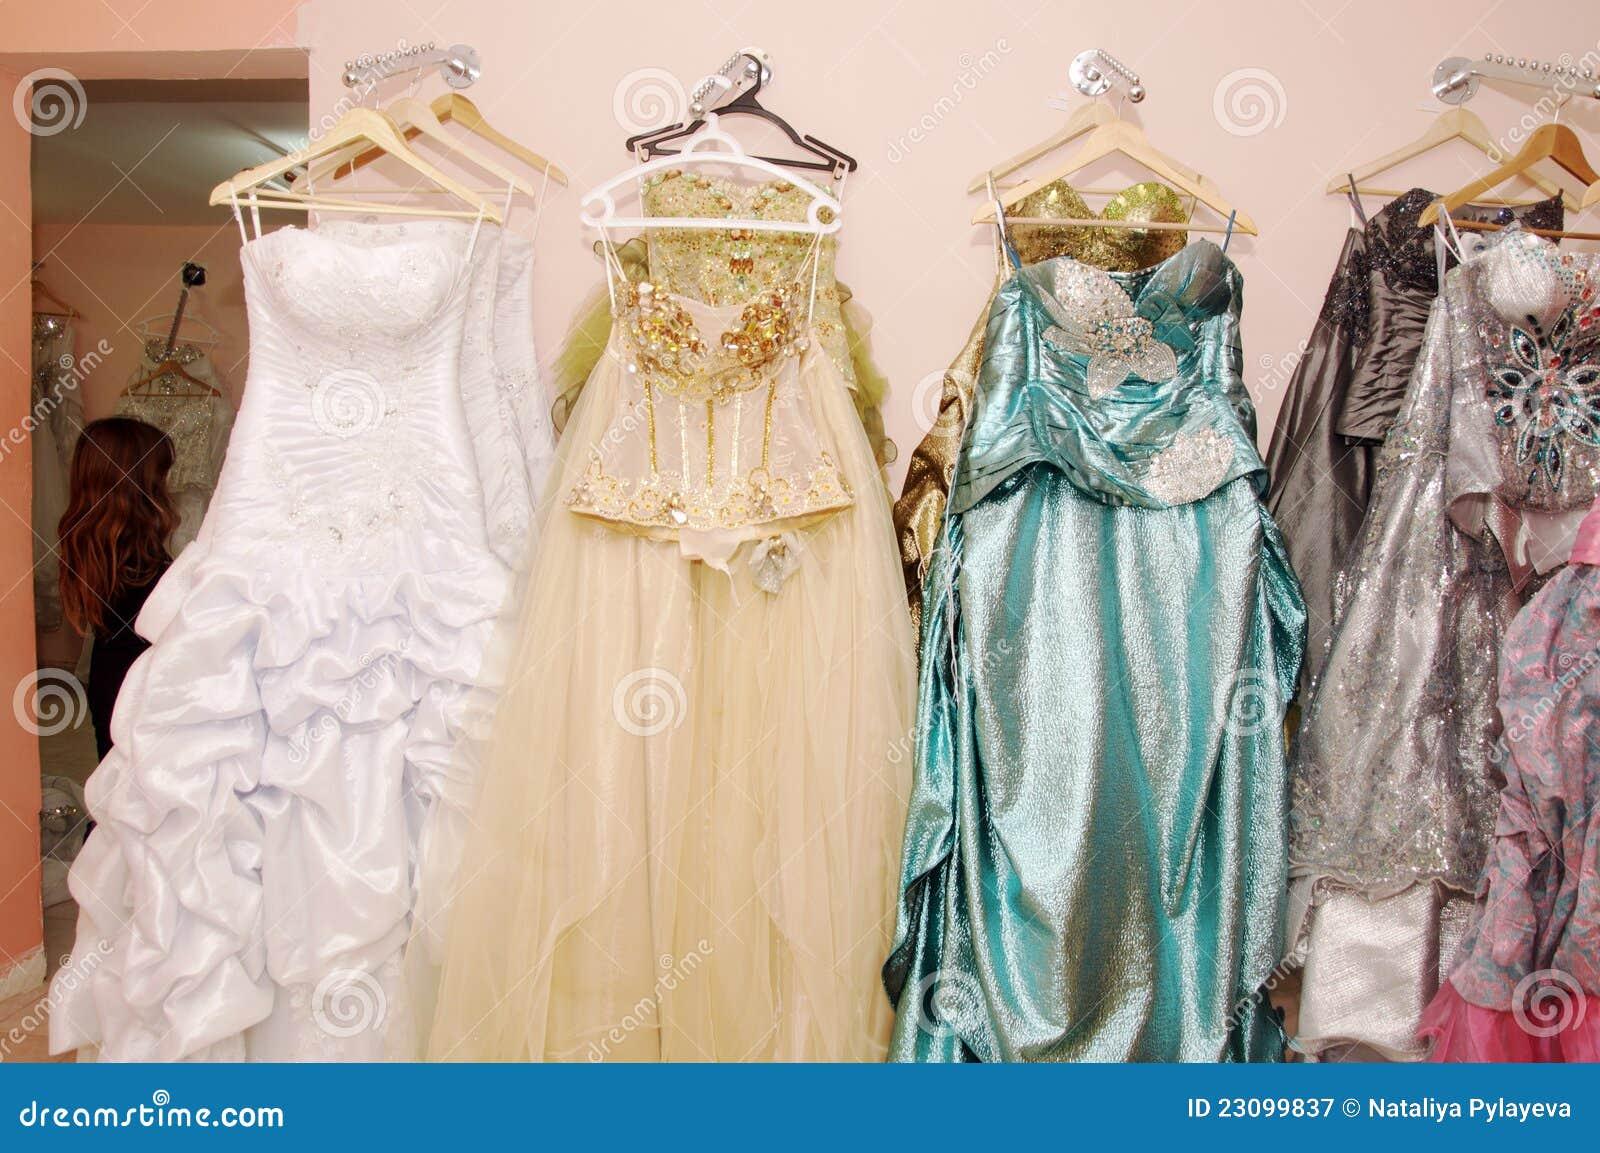 The Arabian Wedding Dresses Stock Image - Image of beautiful, arab ...